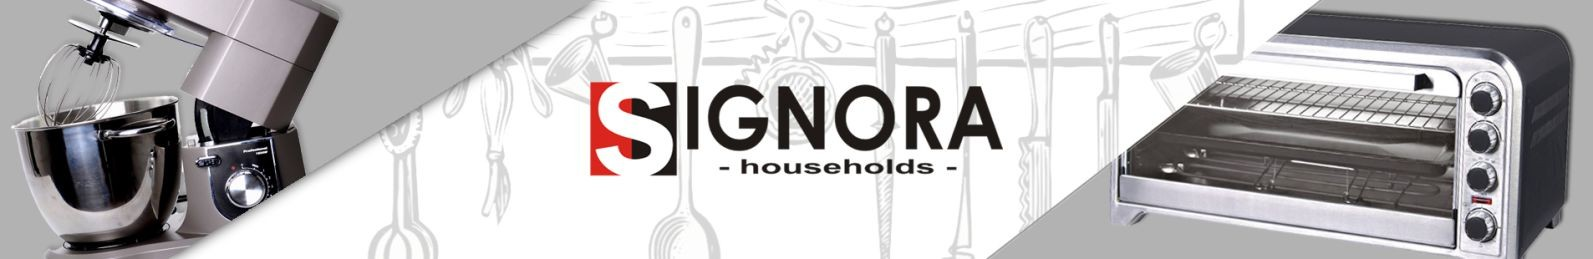 SIGNORA Households